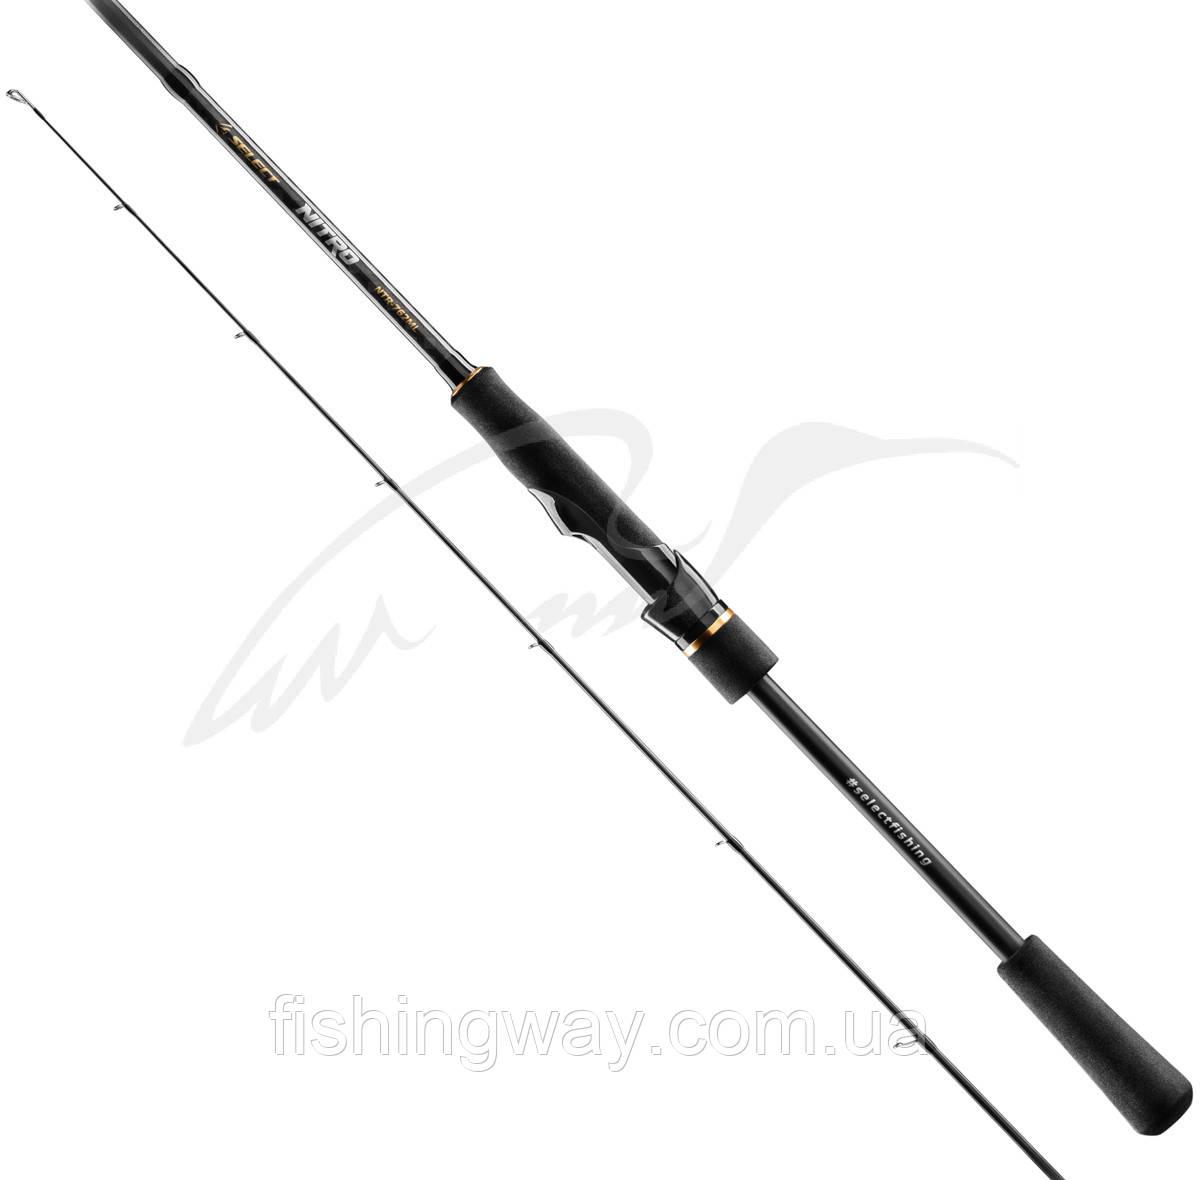 Спиннинг Select Nitro NTR-702MH 2.13m 7-28g Fast